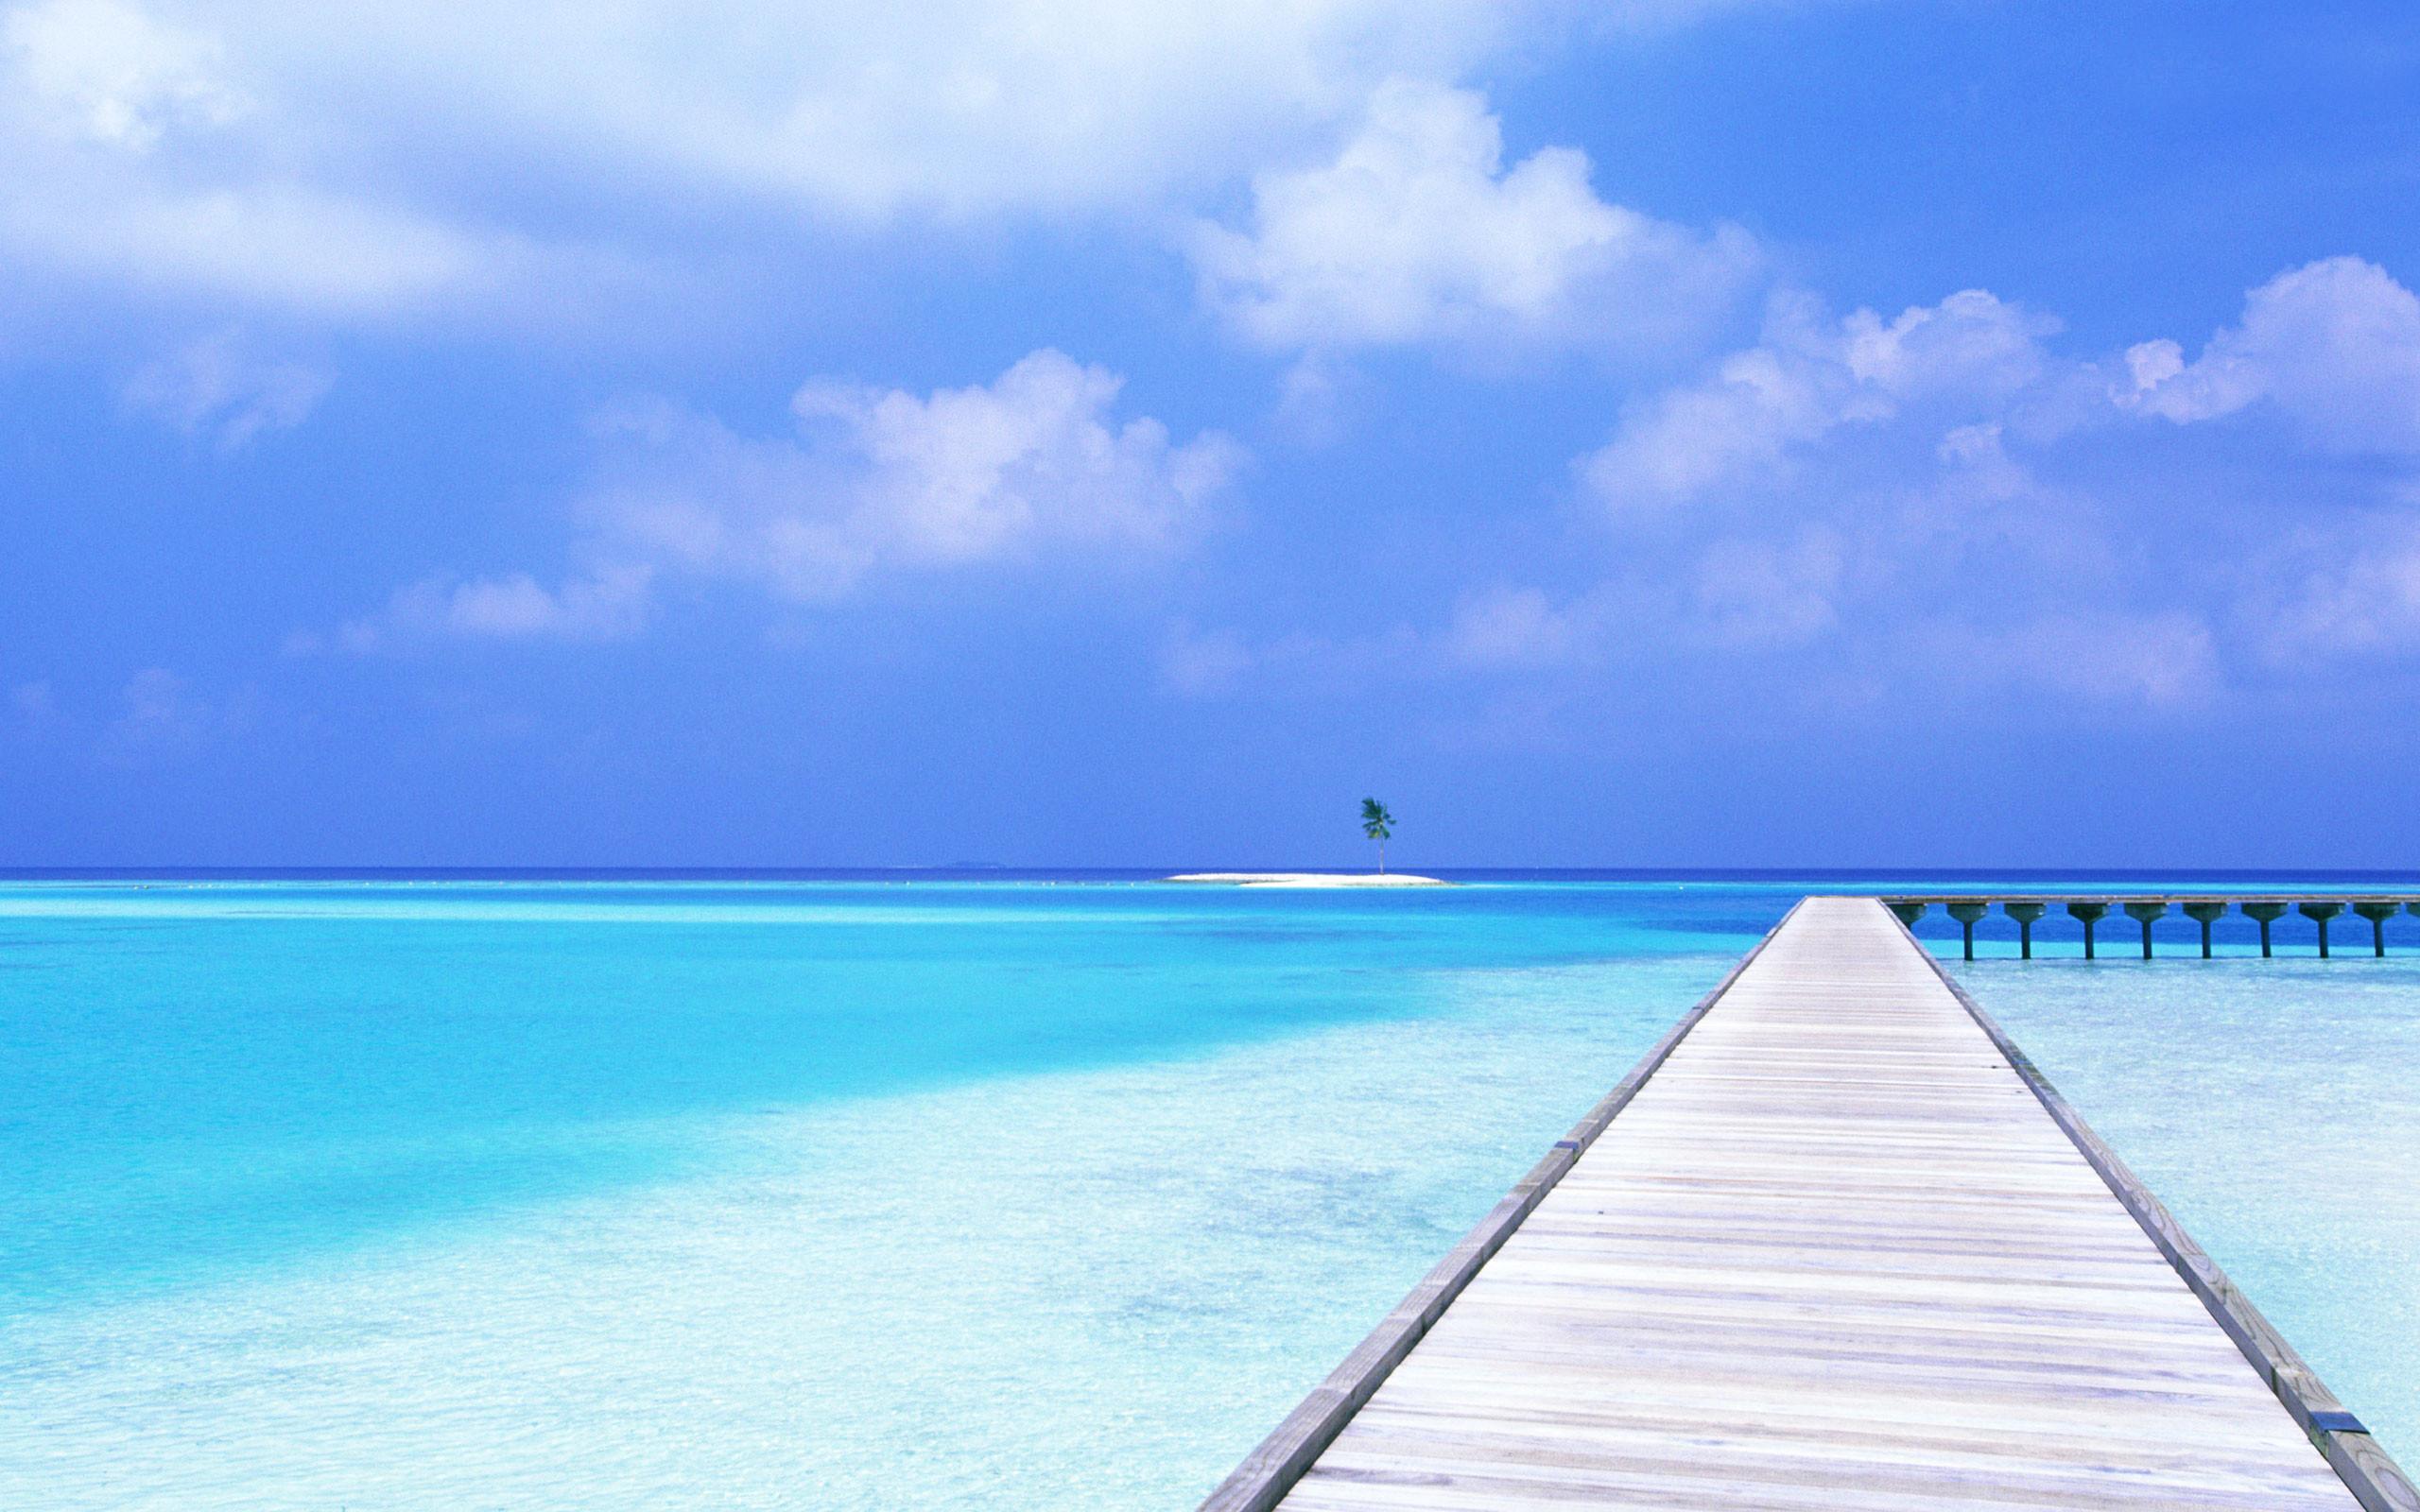 Res: 2560x1600, amazing ocean wallpapers pc desktop desktop images background photos hd  free windows wallpaper samsung iphone mac 2560×1600 Wallpaper HD